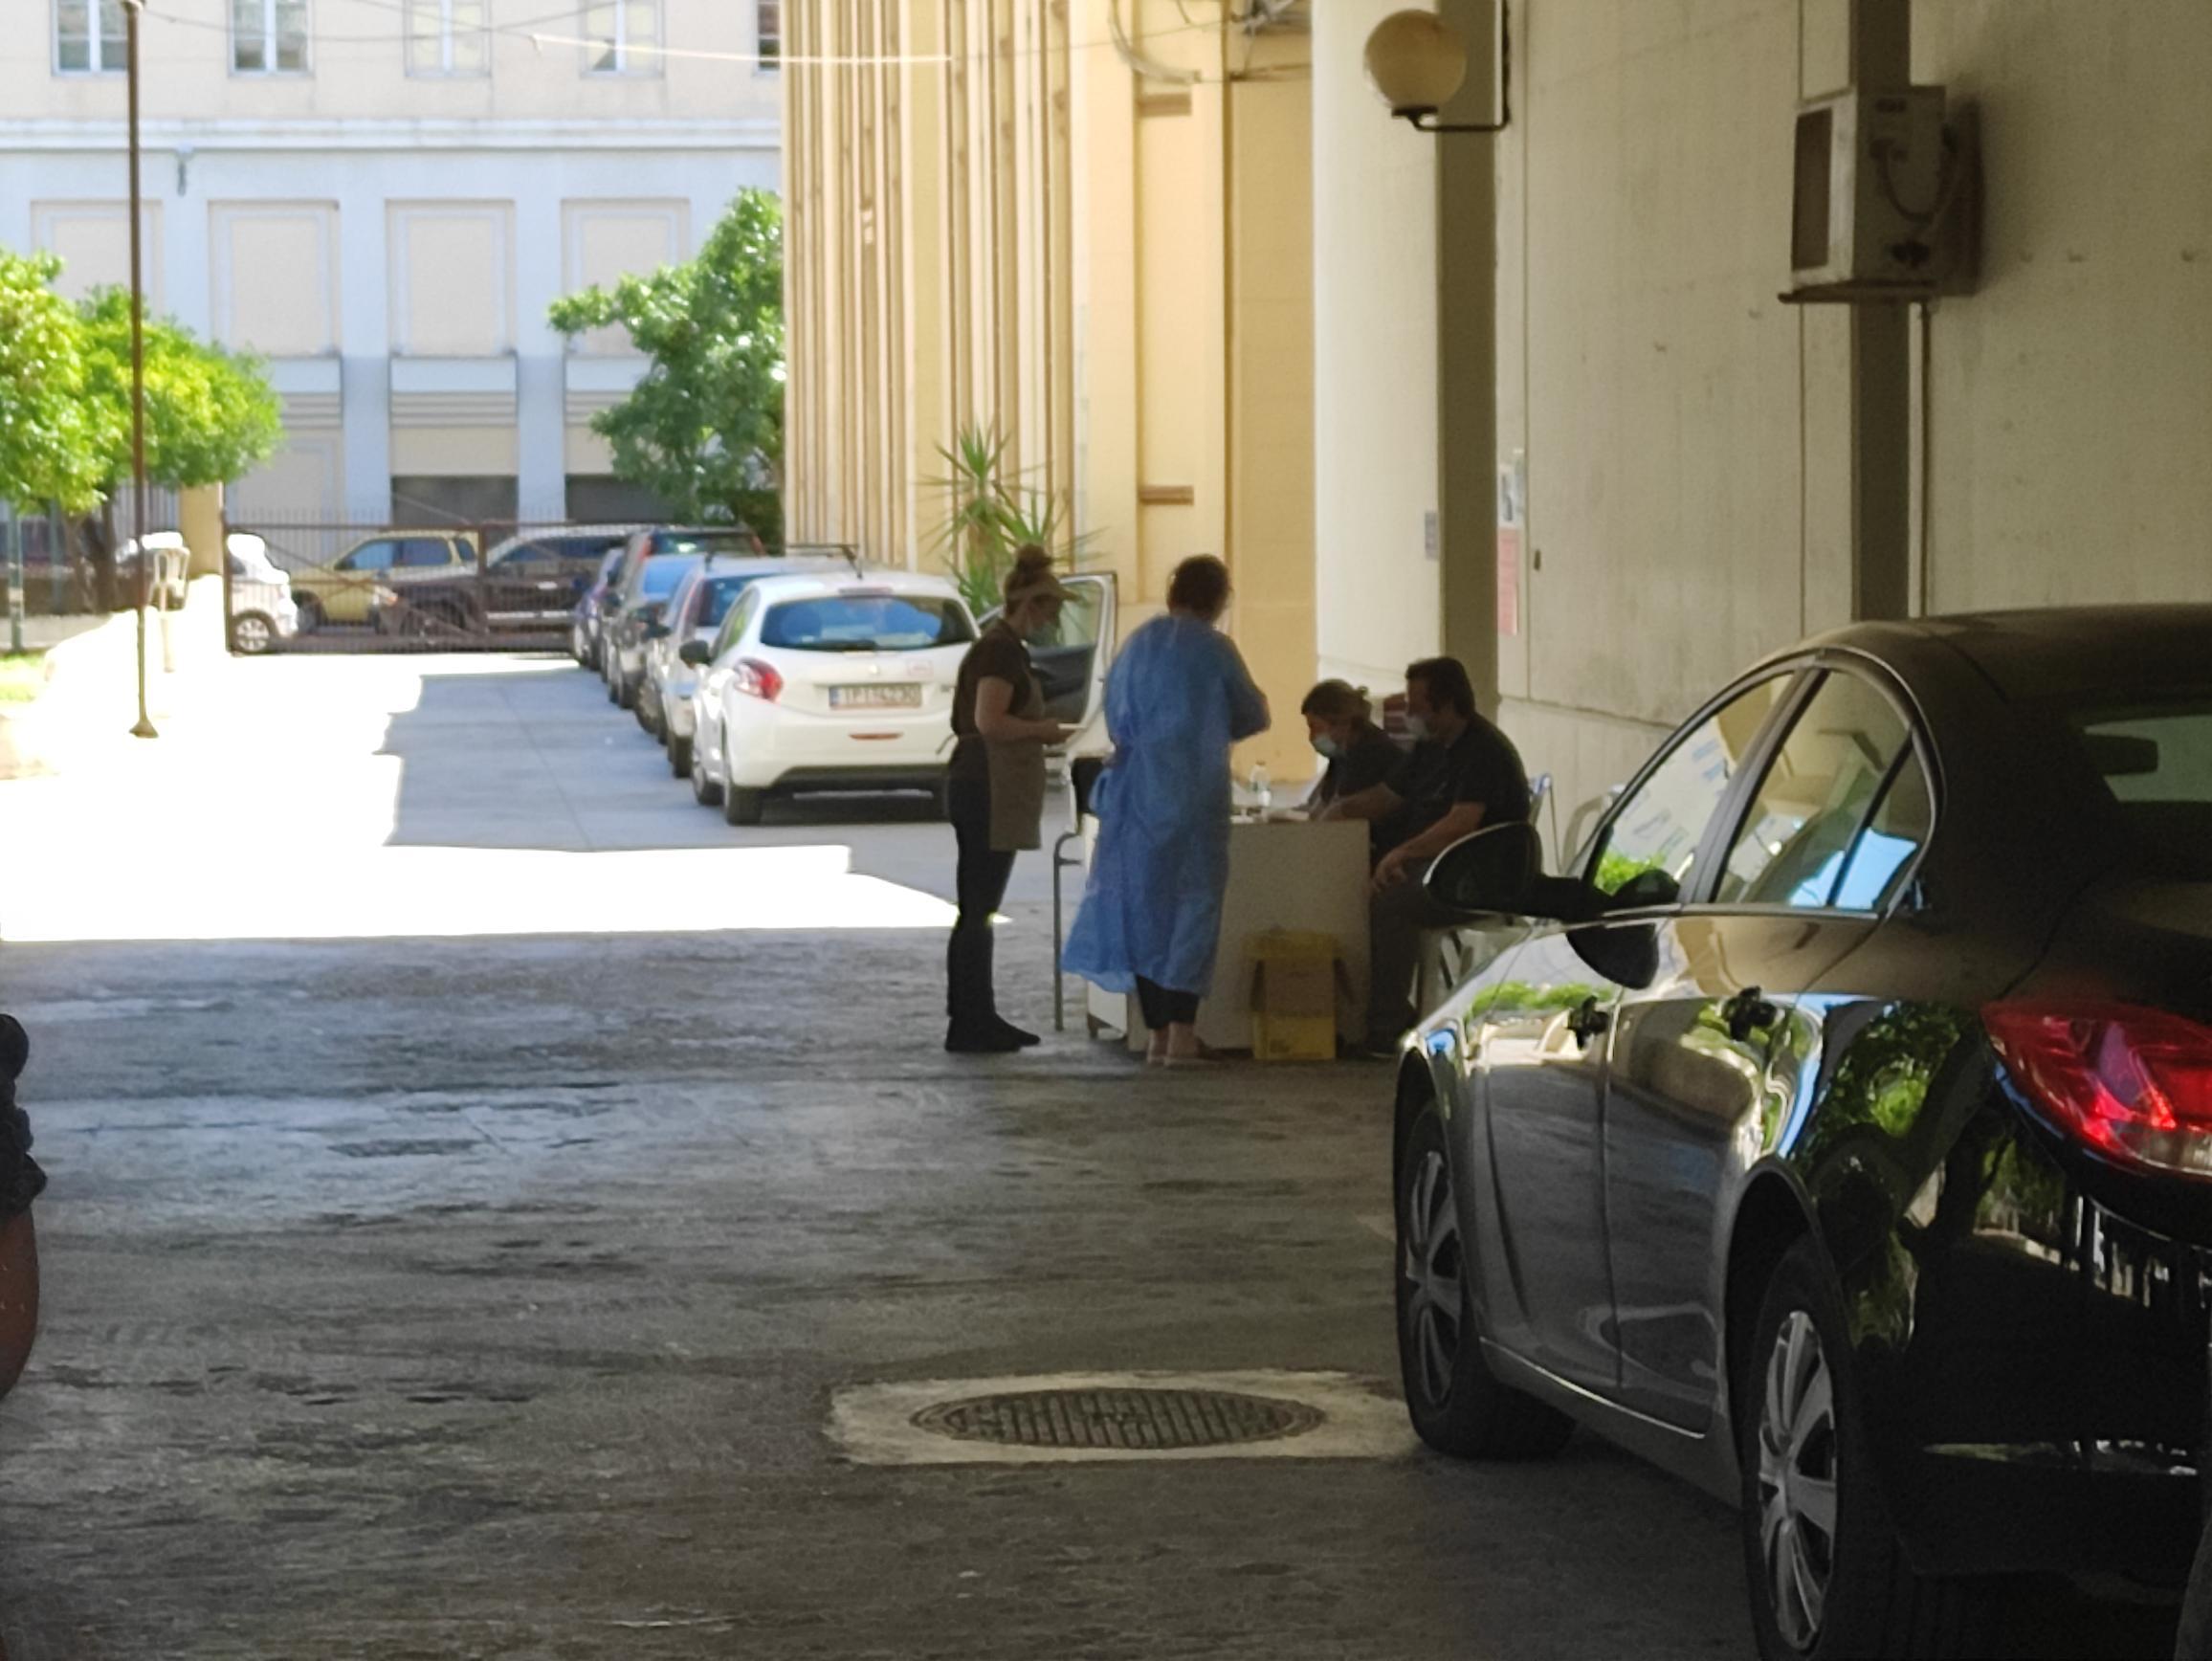 Kορωνοϊός-Αιτωλοακαρνανία: που εντοπίζονται τα κρούσματα του περασμένου τριημέρου (23-25/9)